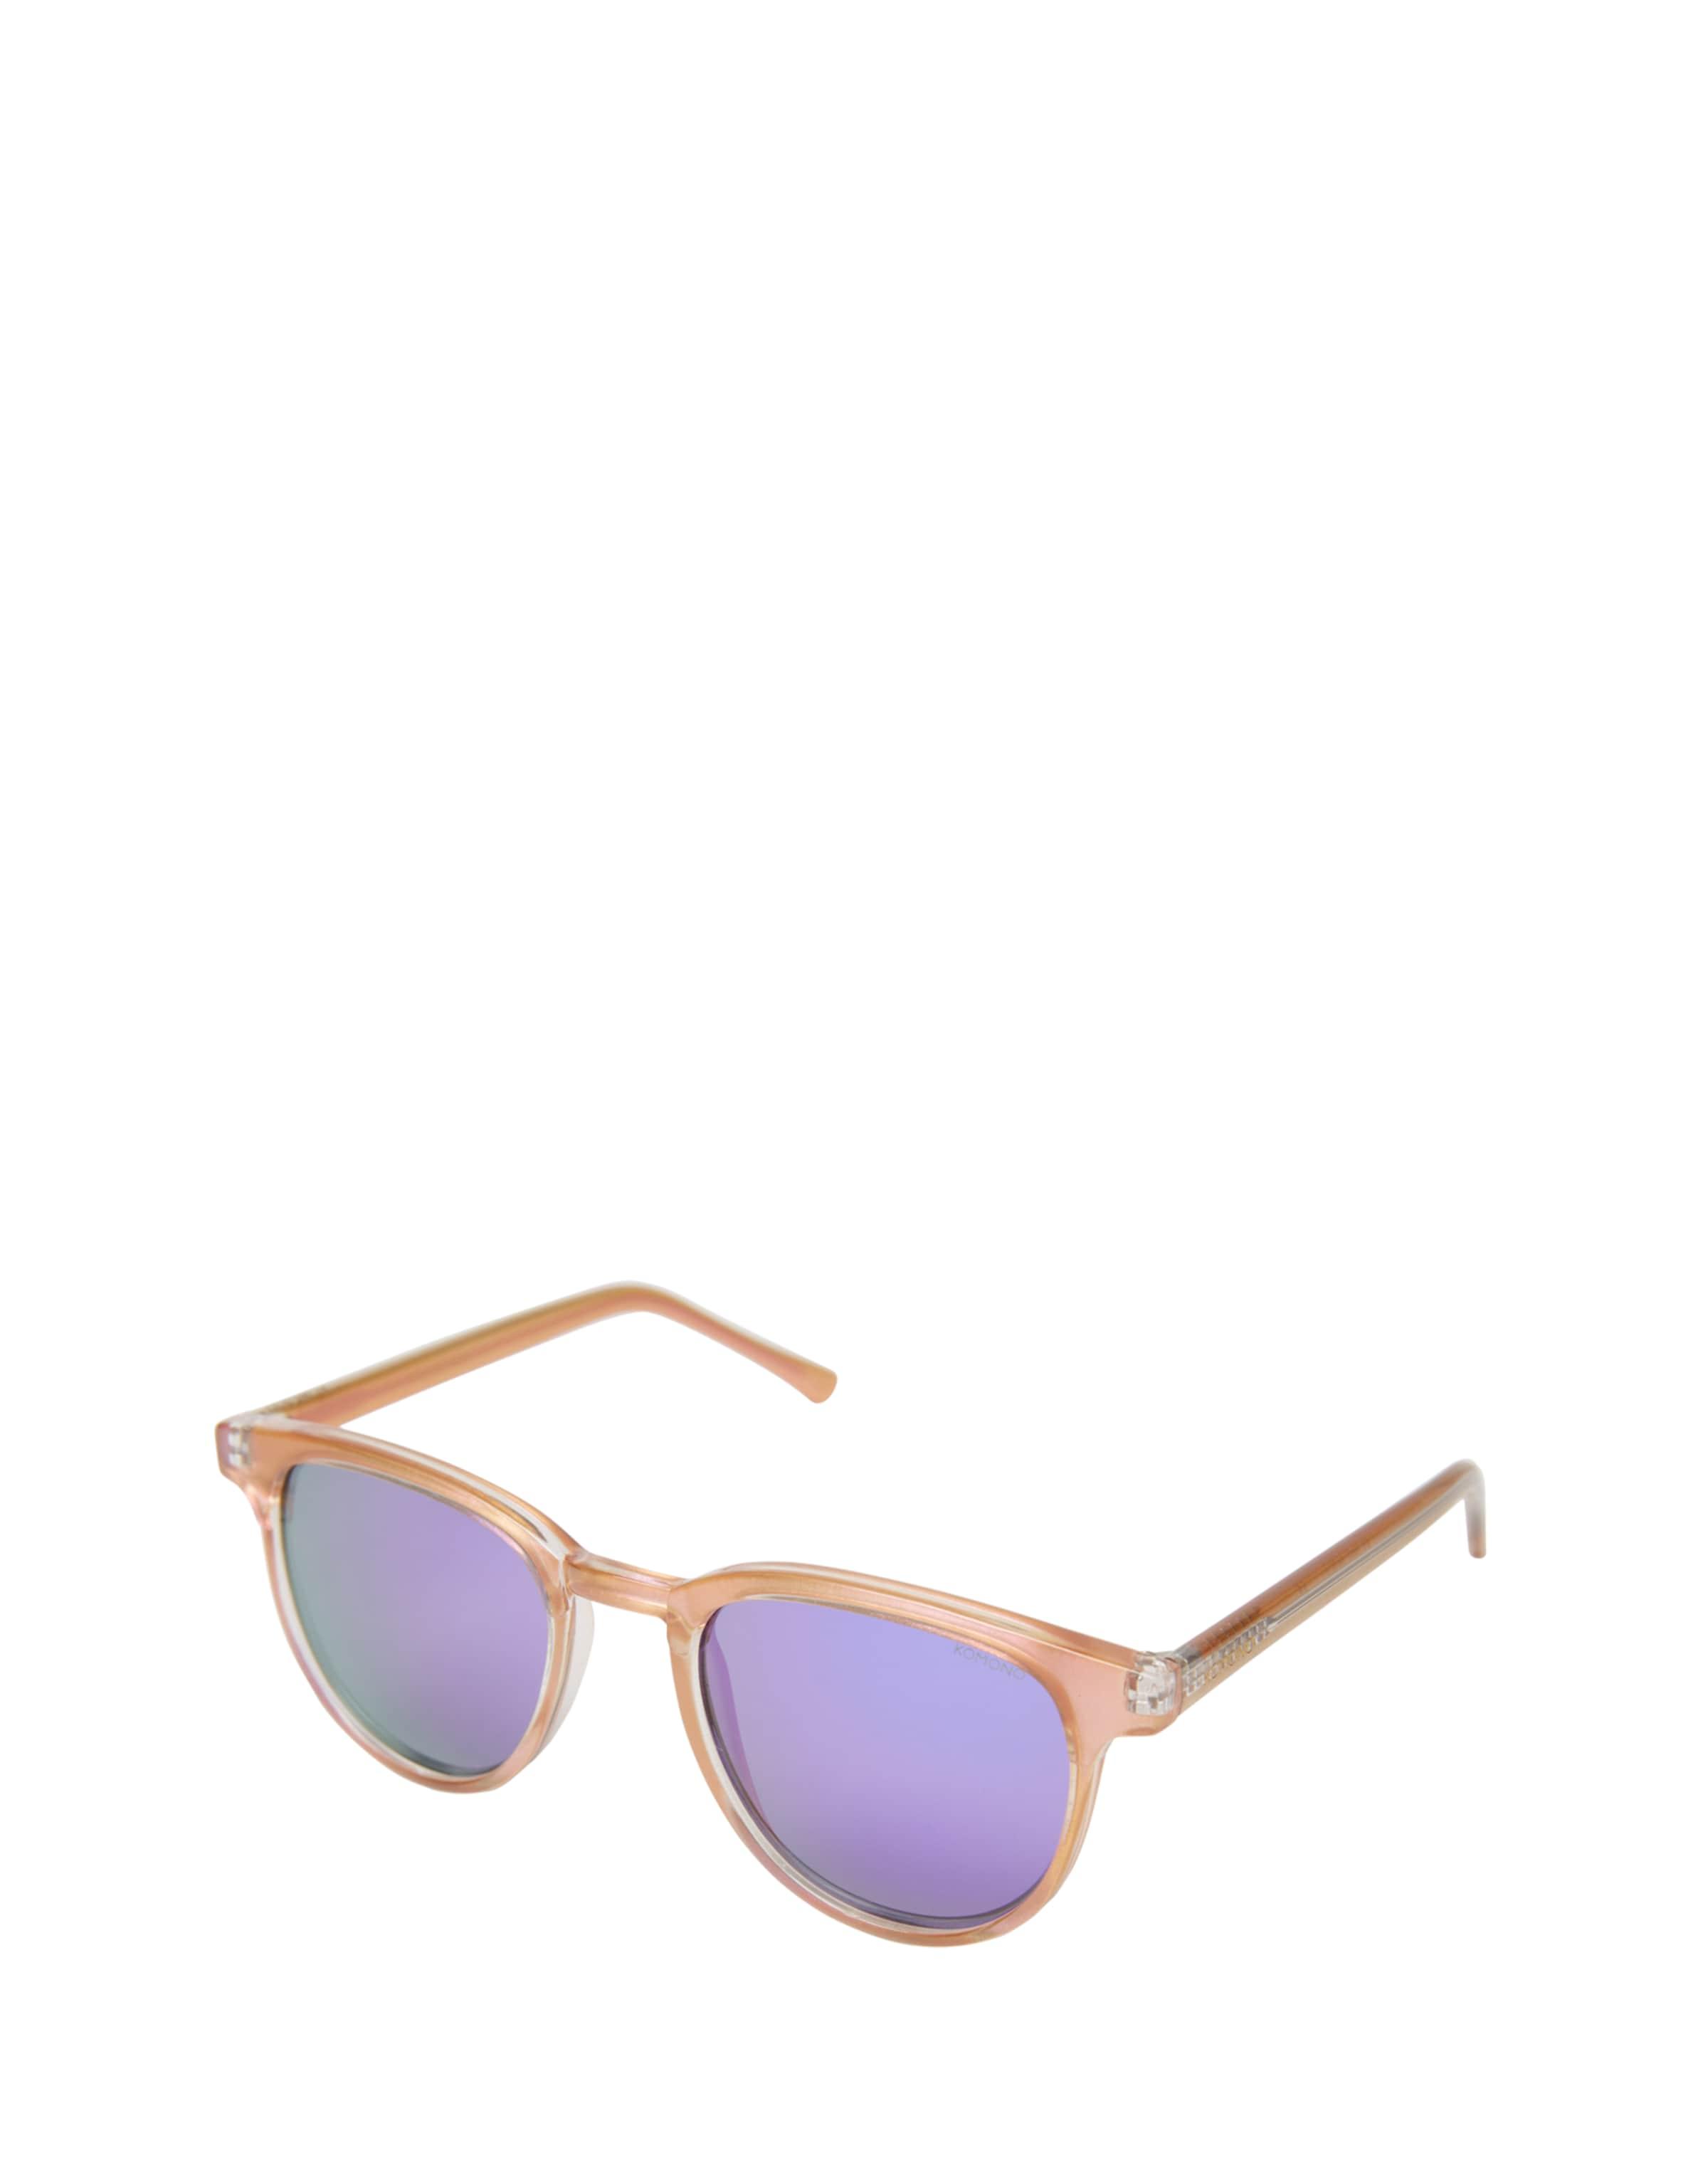 Komono Sonnenbrille 'Francis' Preis 1NA1Fx